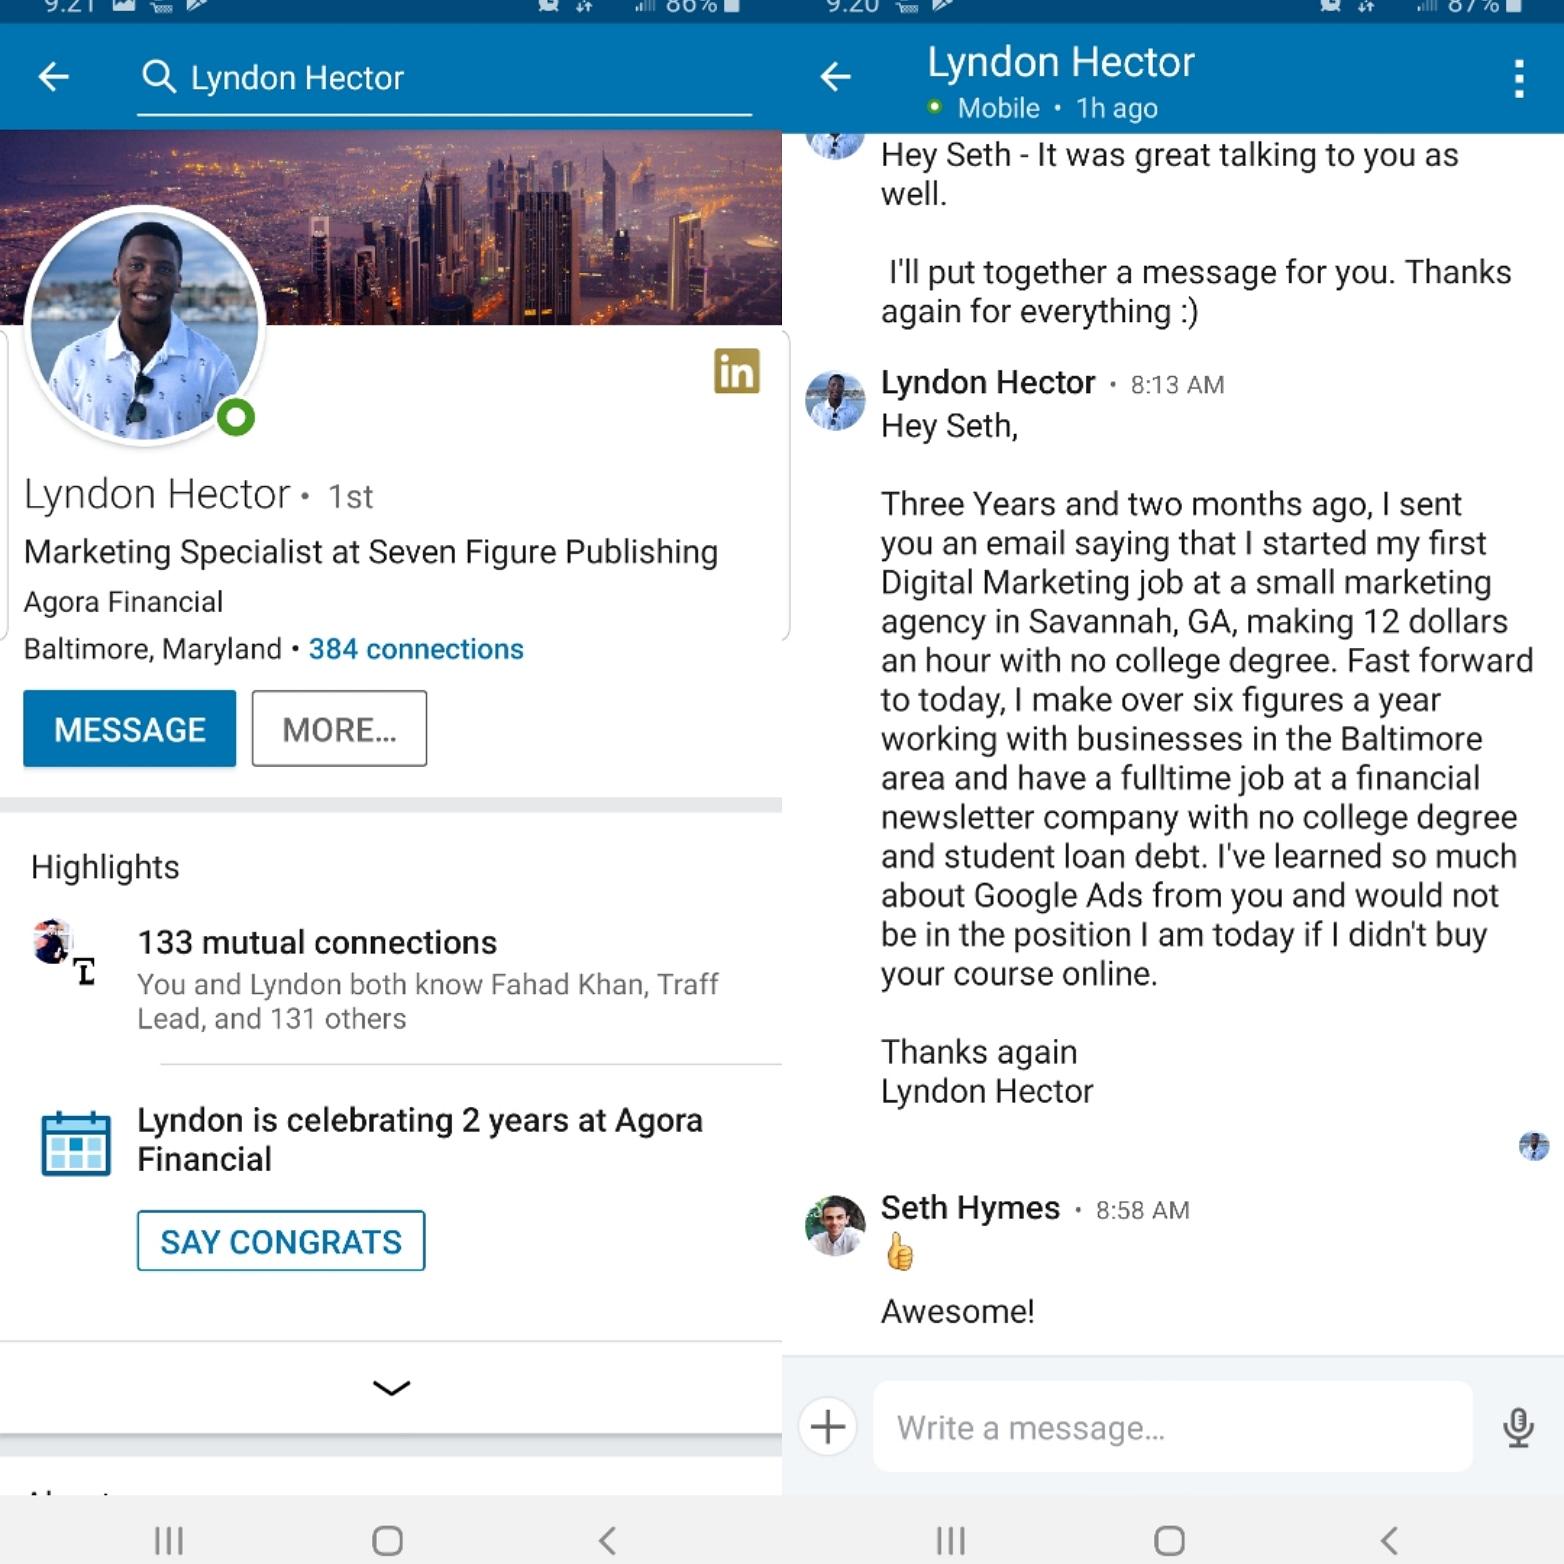 2 - Lyndon Interview